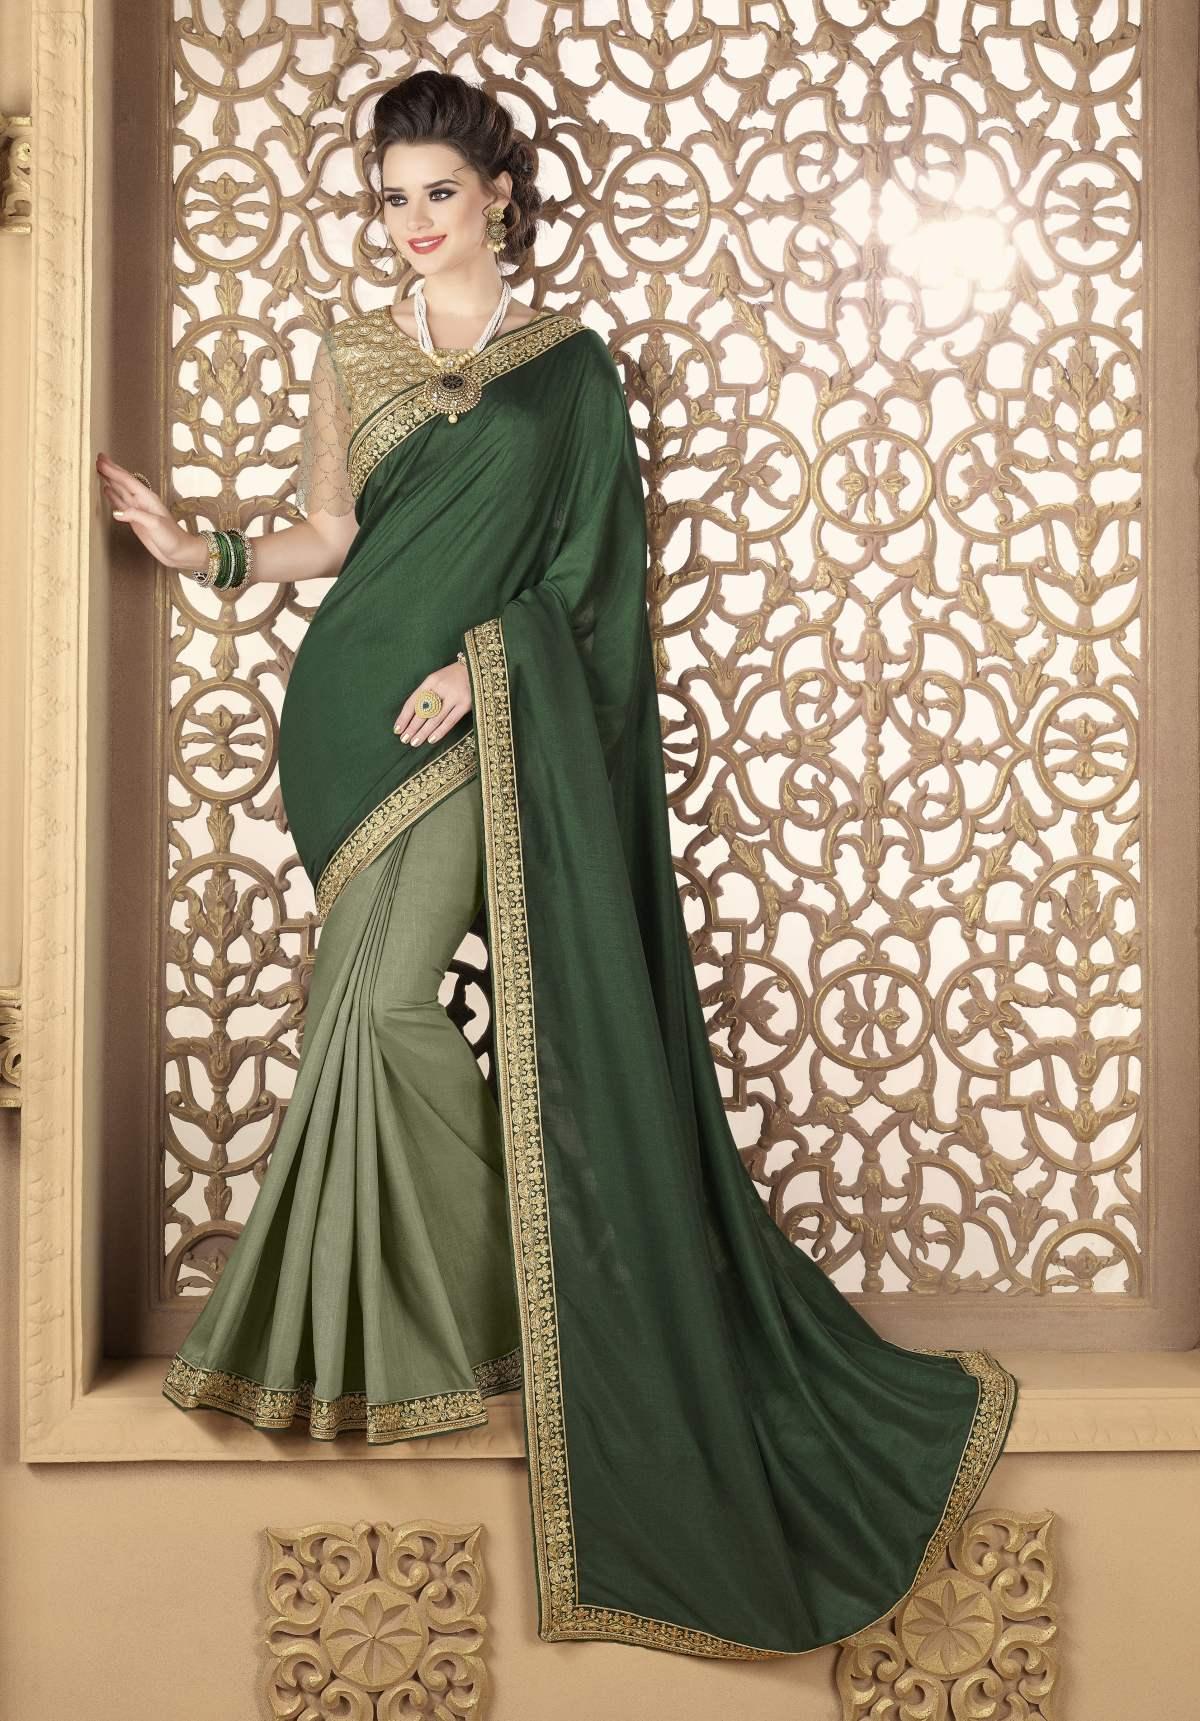 Embroidered Silk Saree (Sari) in Green